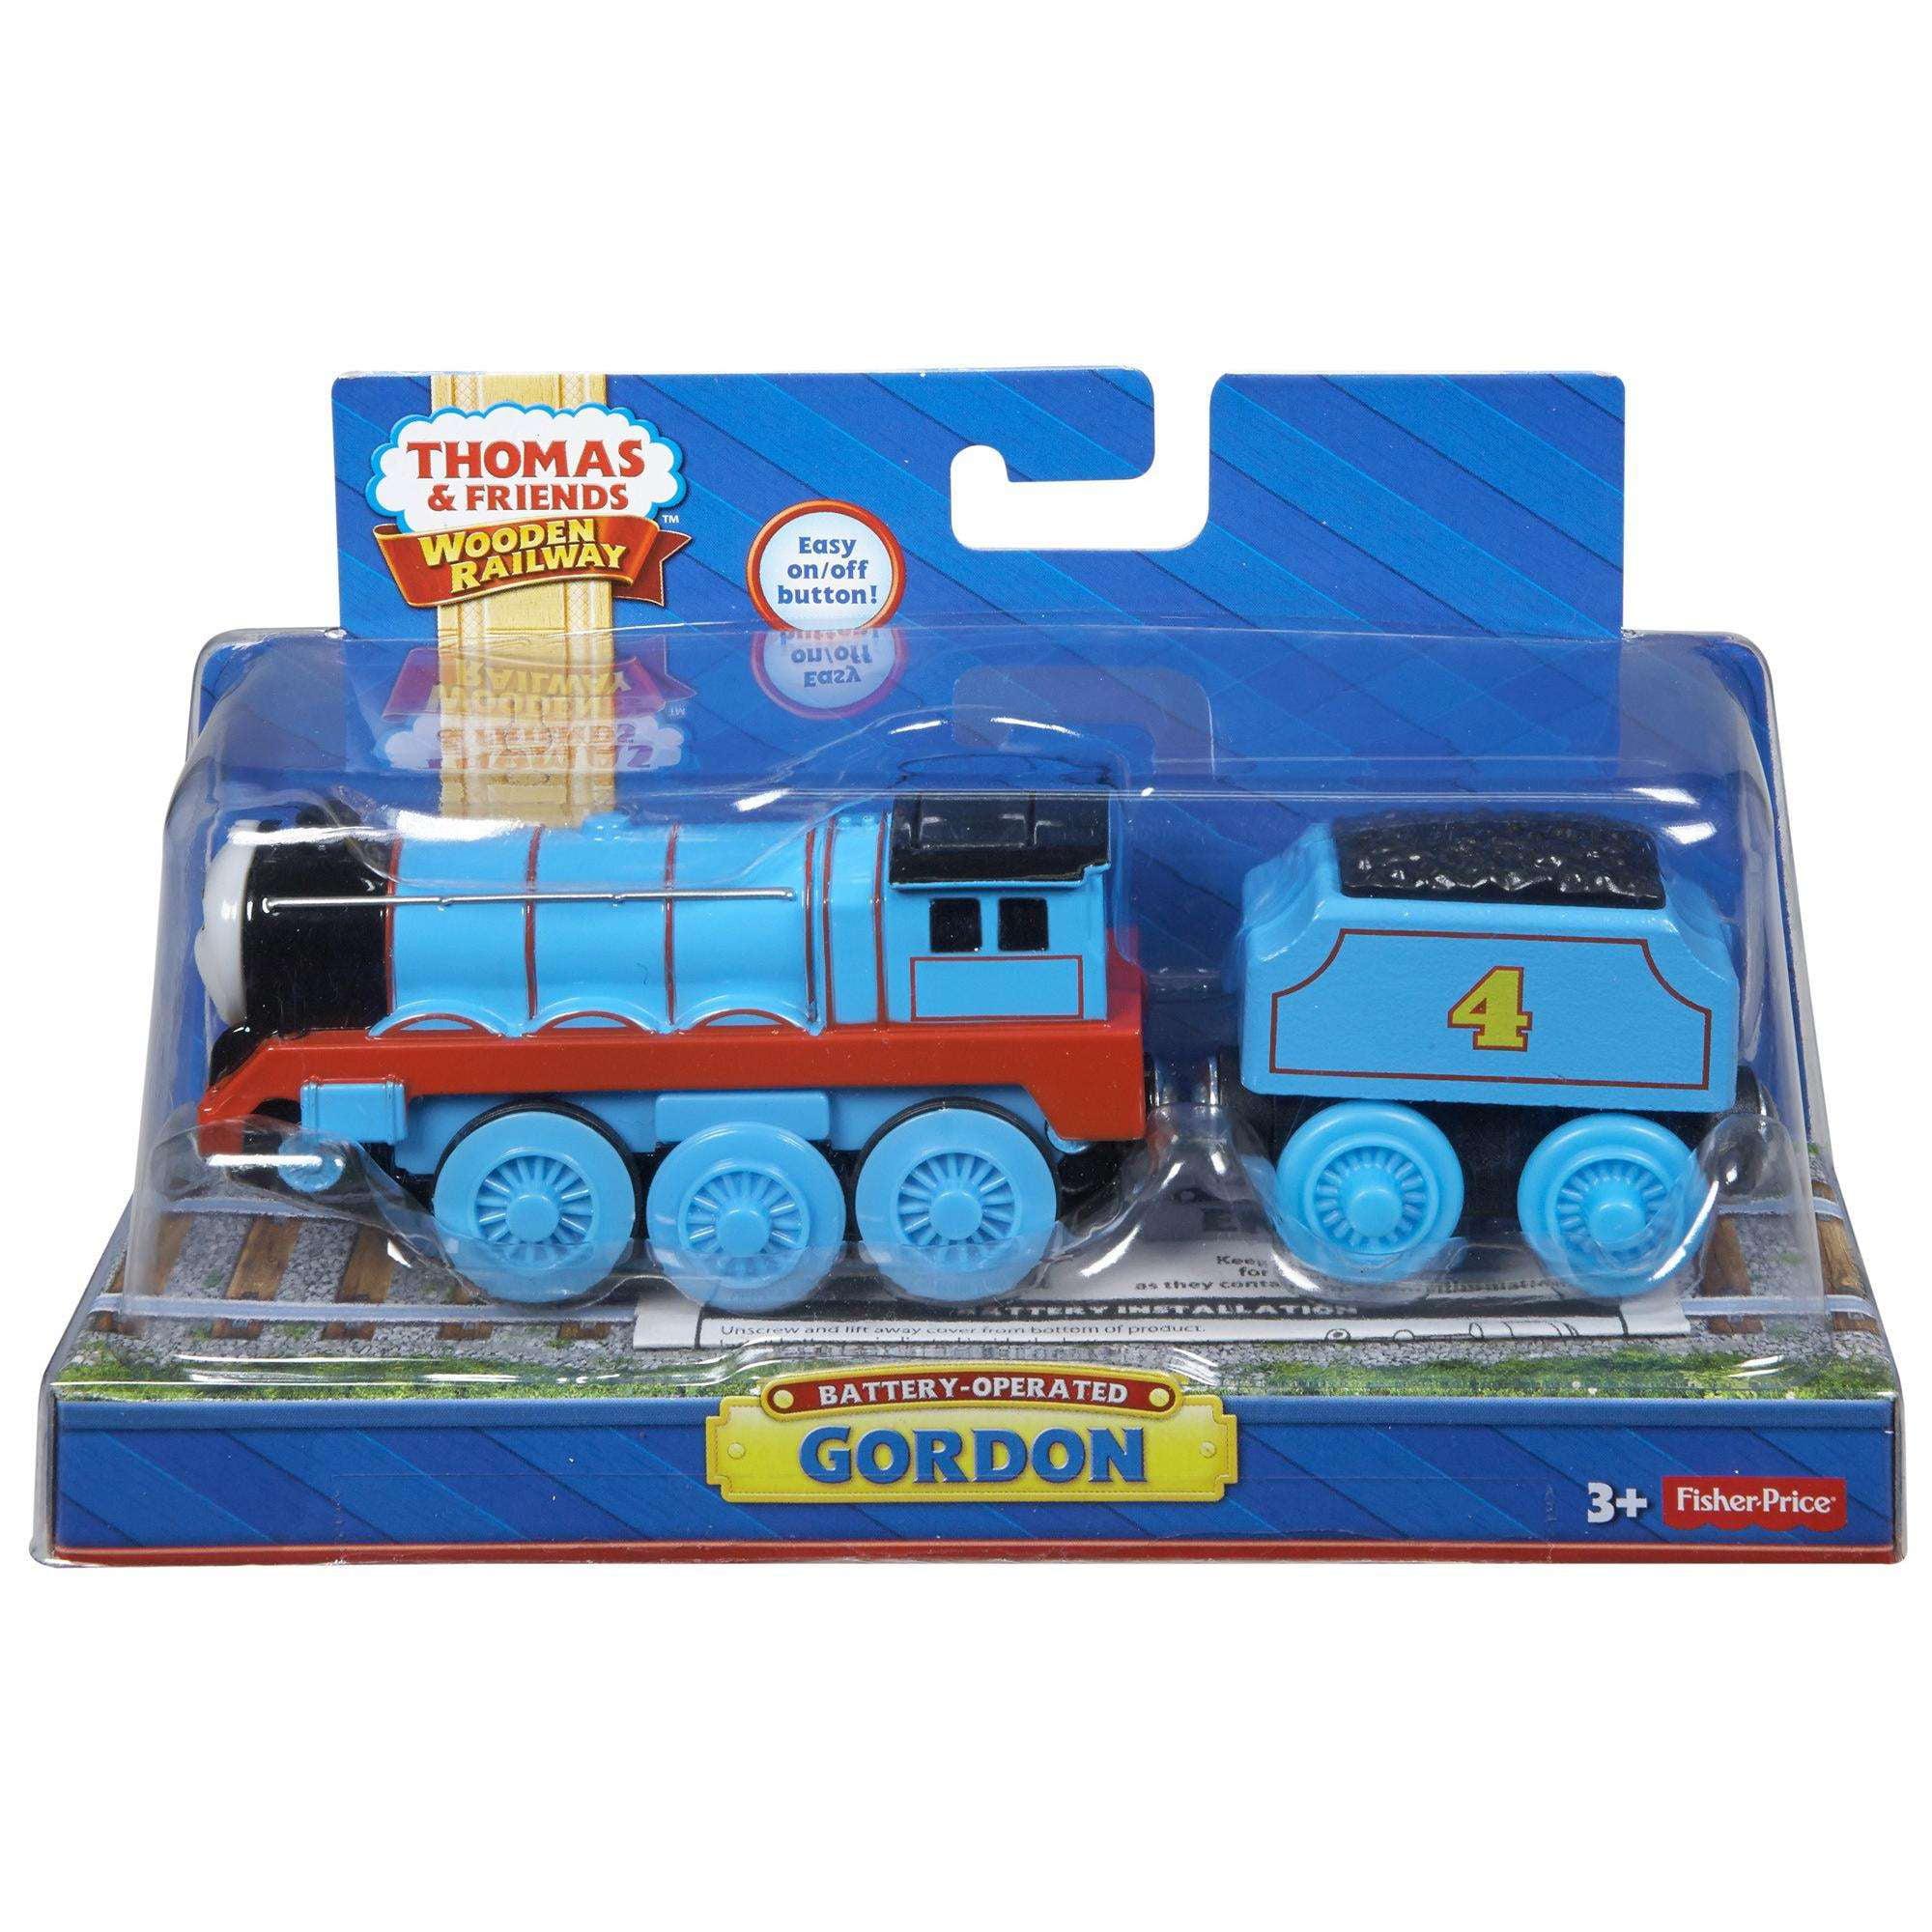 Thomas Friends Wooden Railway Twr Engine Battery Operated Gordon